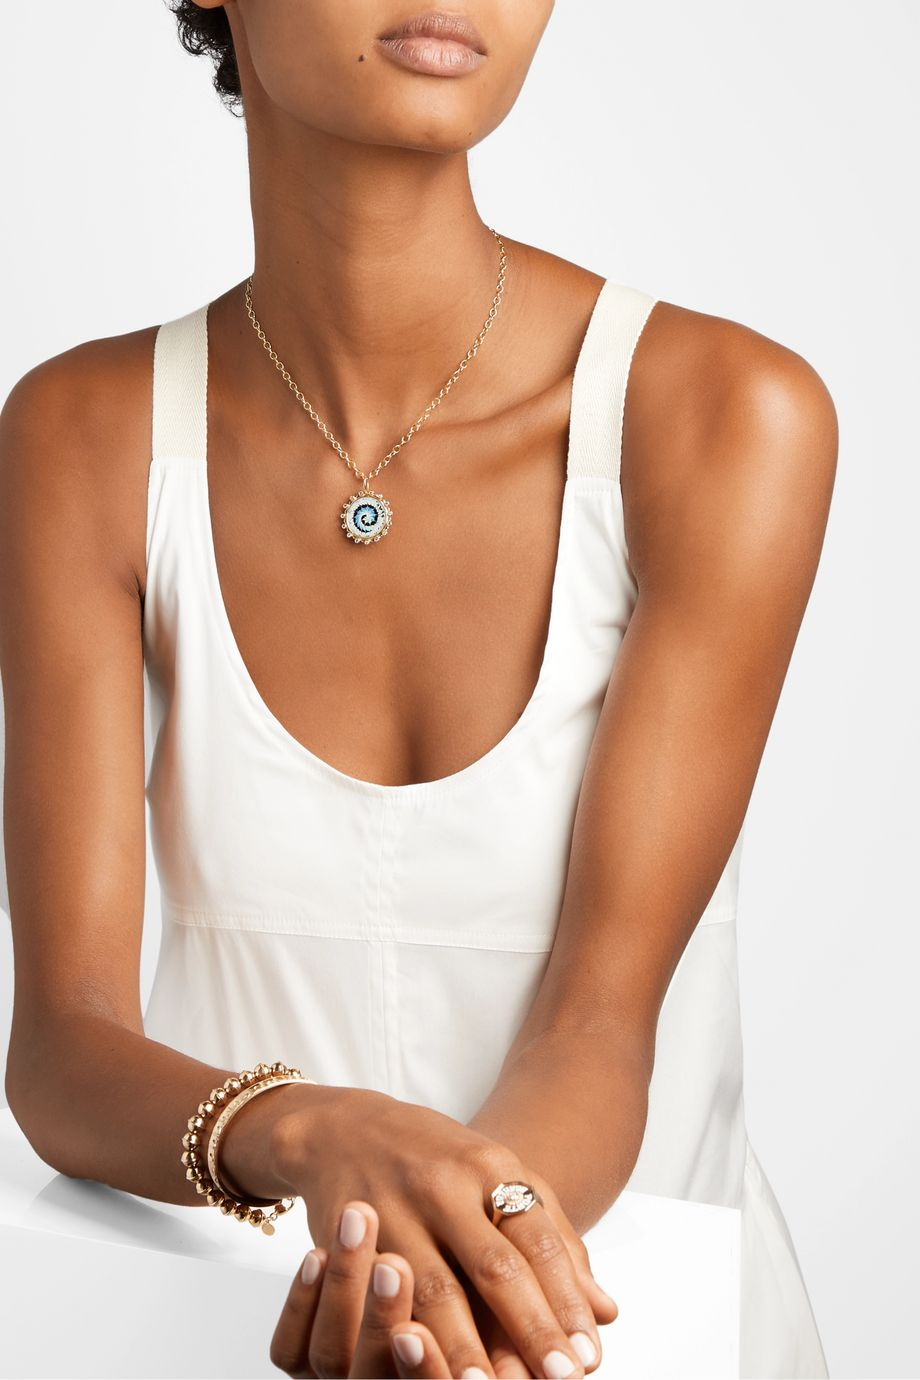 Marlo Laz Tie Dye 14-karat gold, enamel, tanzanite and peridot necklace